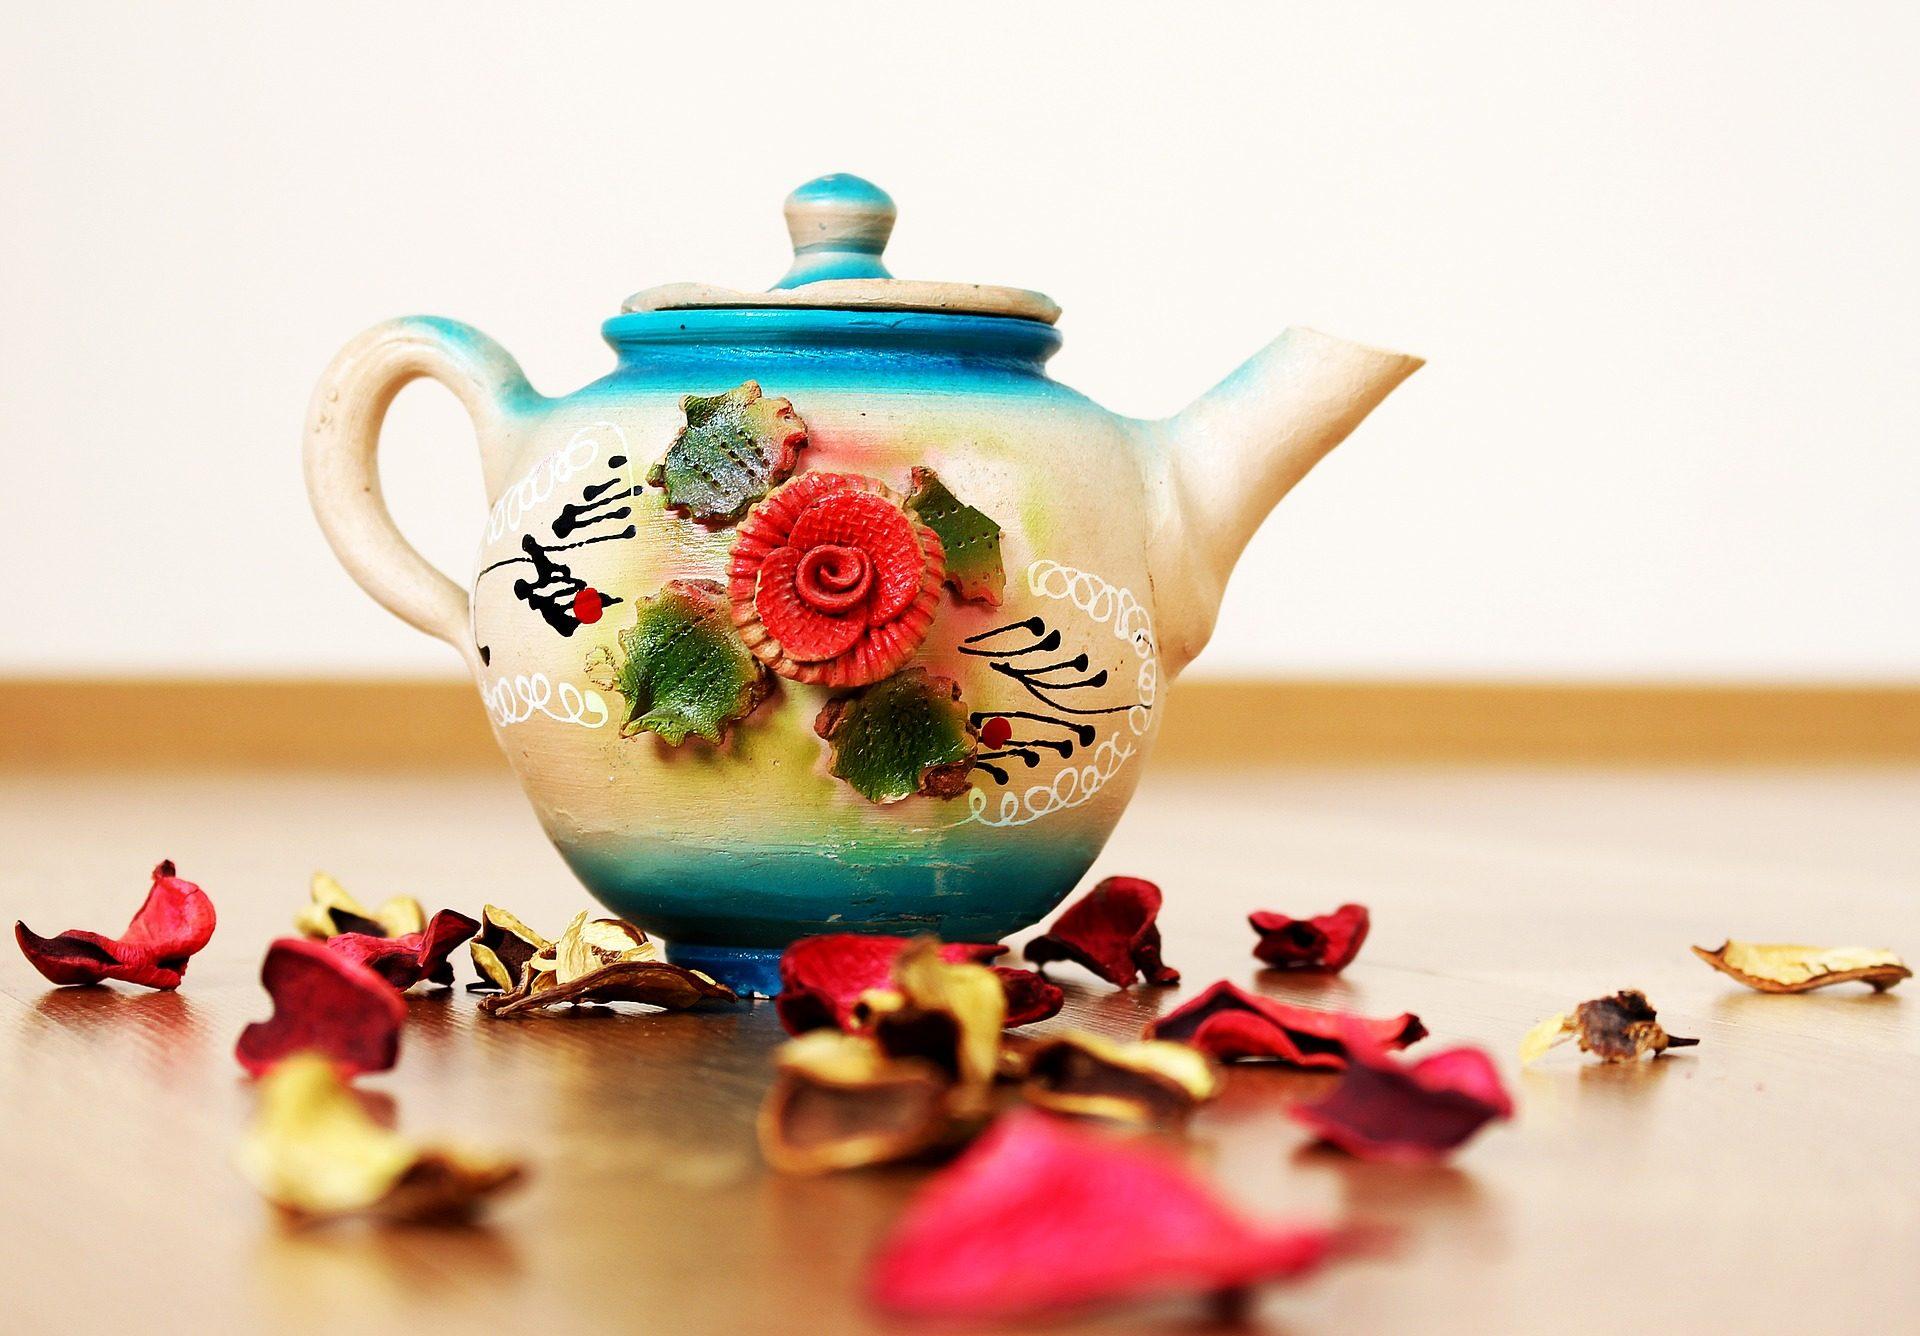 tetera, τσάι, φύλλα, διακόσμηση, σχέδια - Wallpapers HD - Professor-falken.com